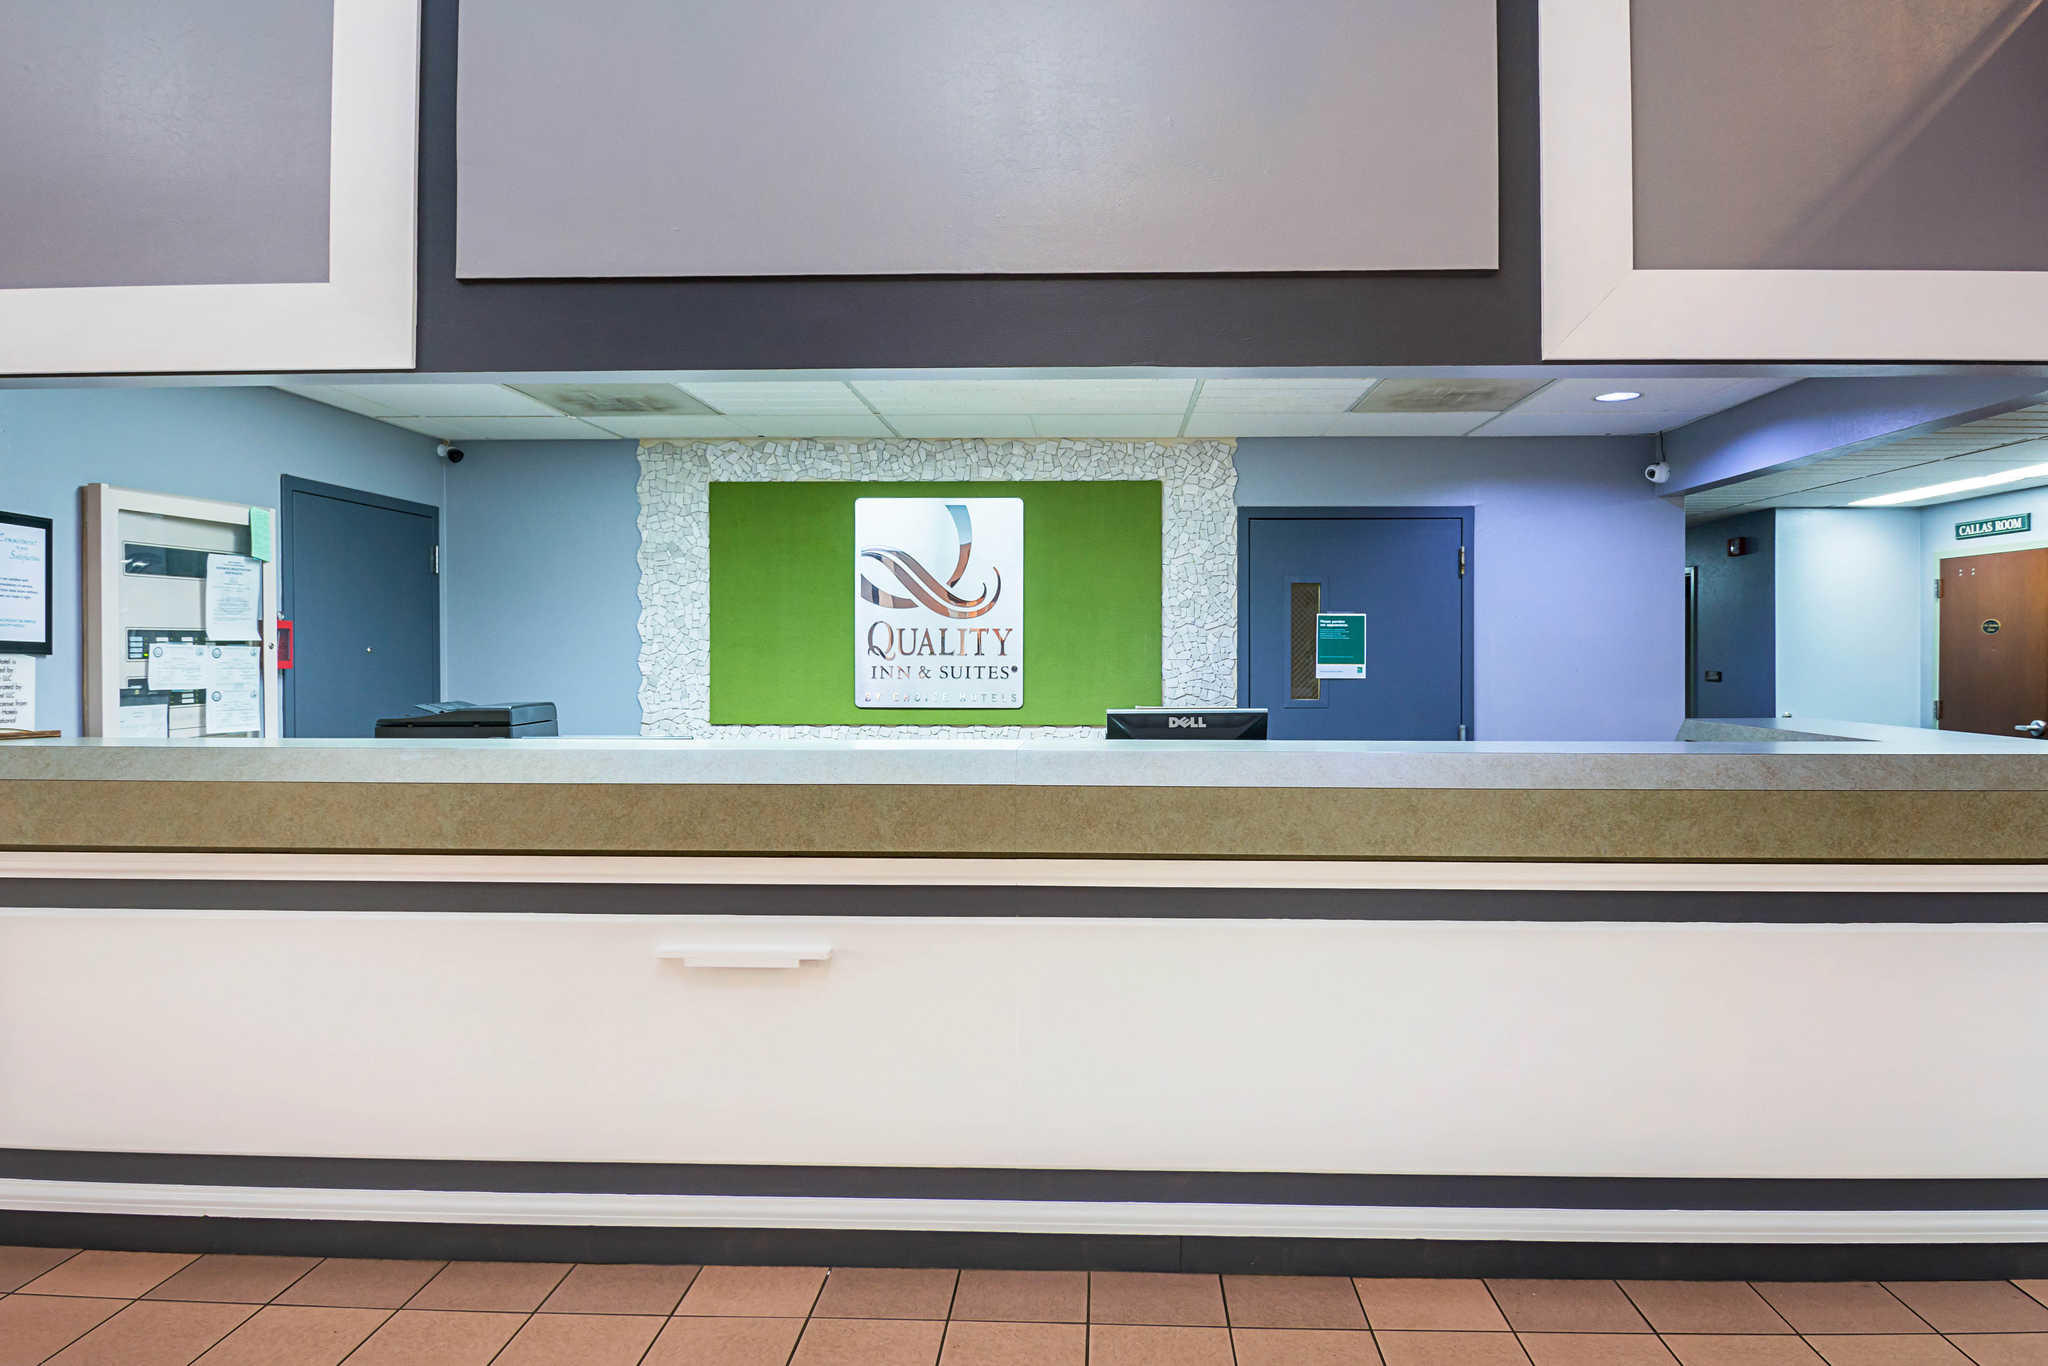 Quality Inn & Suites Kearneysville - Martinsburg image 4